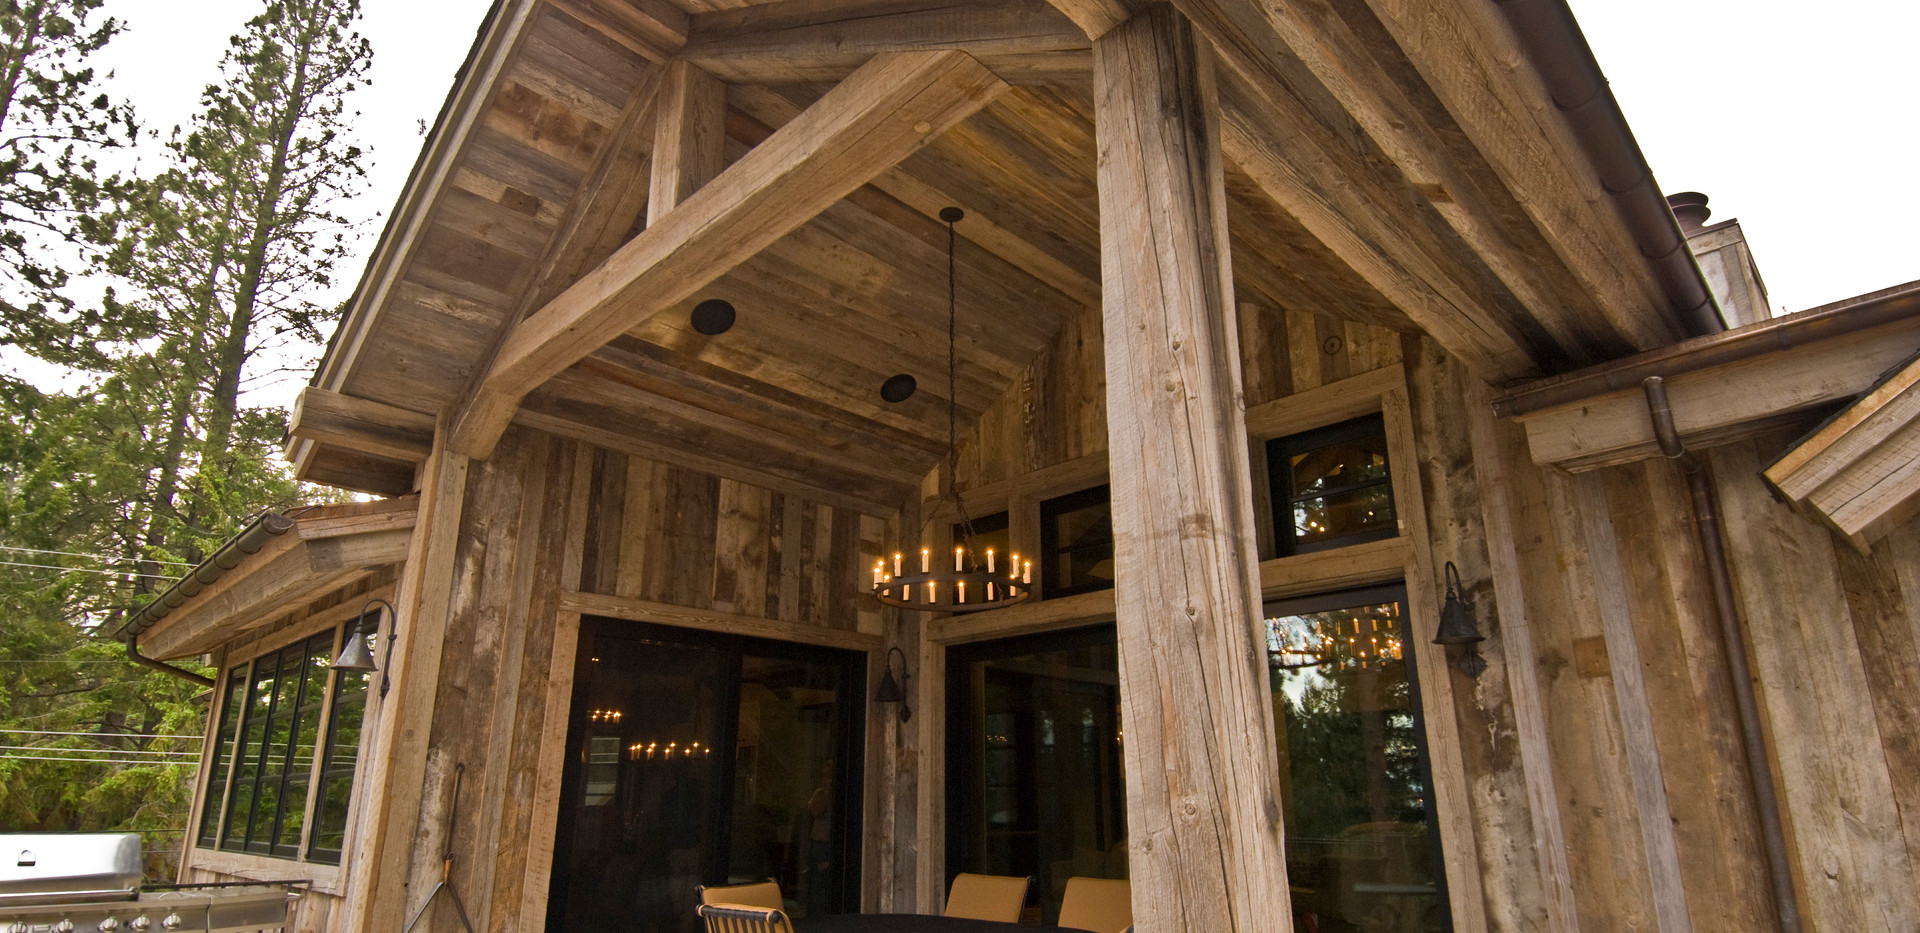 Weathered Timber & Barn Wood Gray